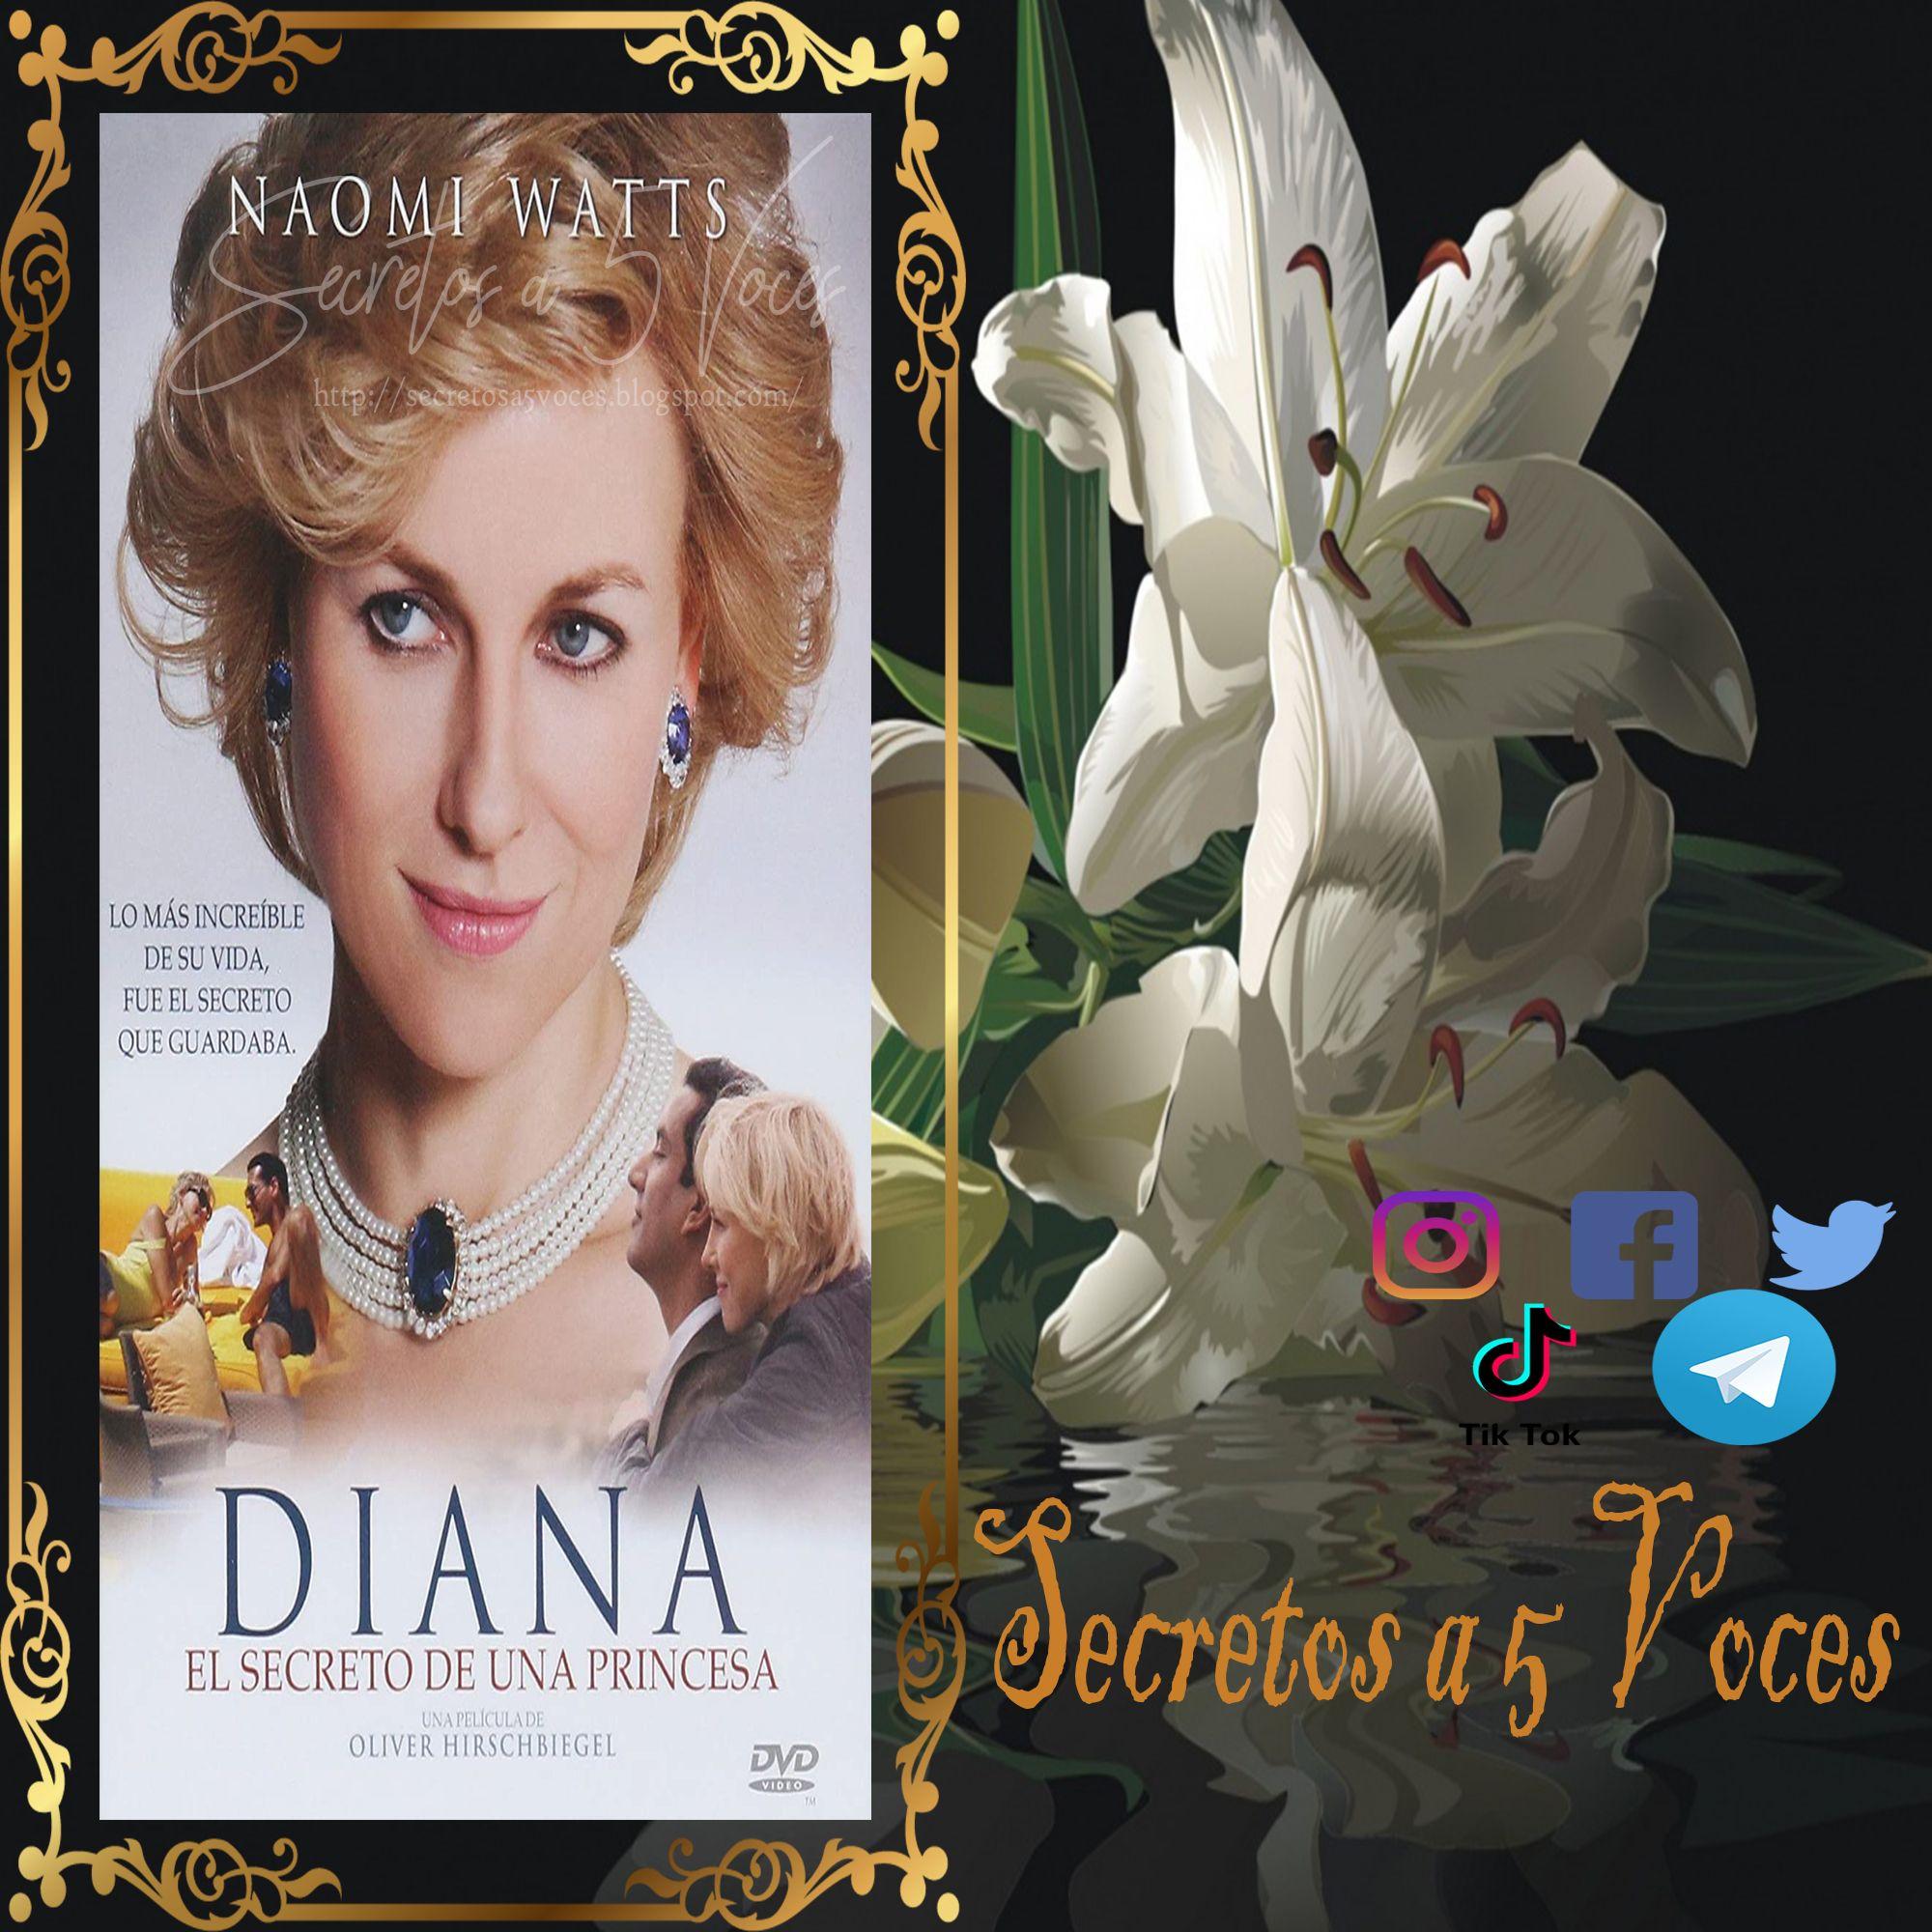 Recomendacion Diana Elsecretodeunaprincesa Secretosa5voces Andi Diana Princesa El Secreto